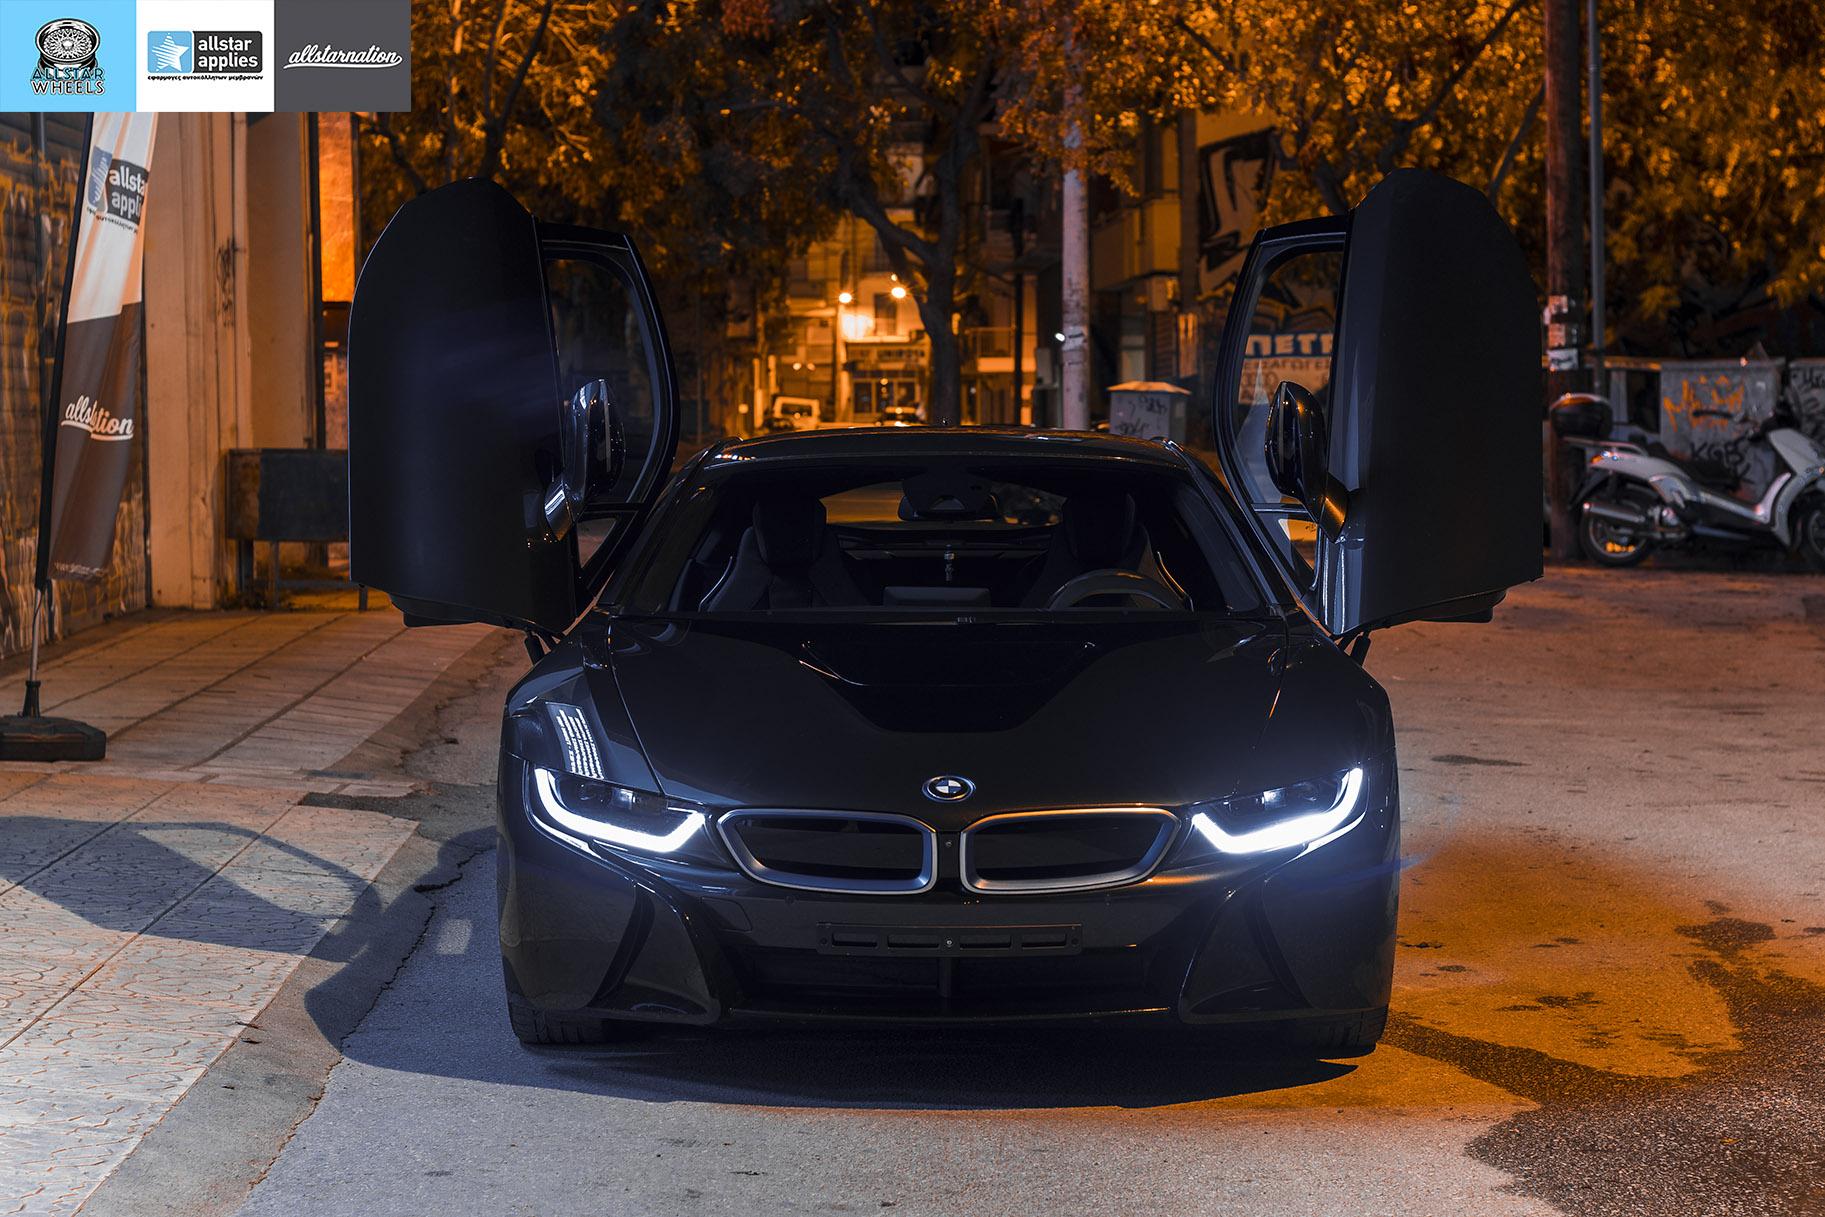 BMW I8 – Μεμβράνες προστασίας χρώματος – Μπροστινό πακέτο (7)